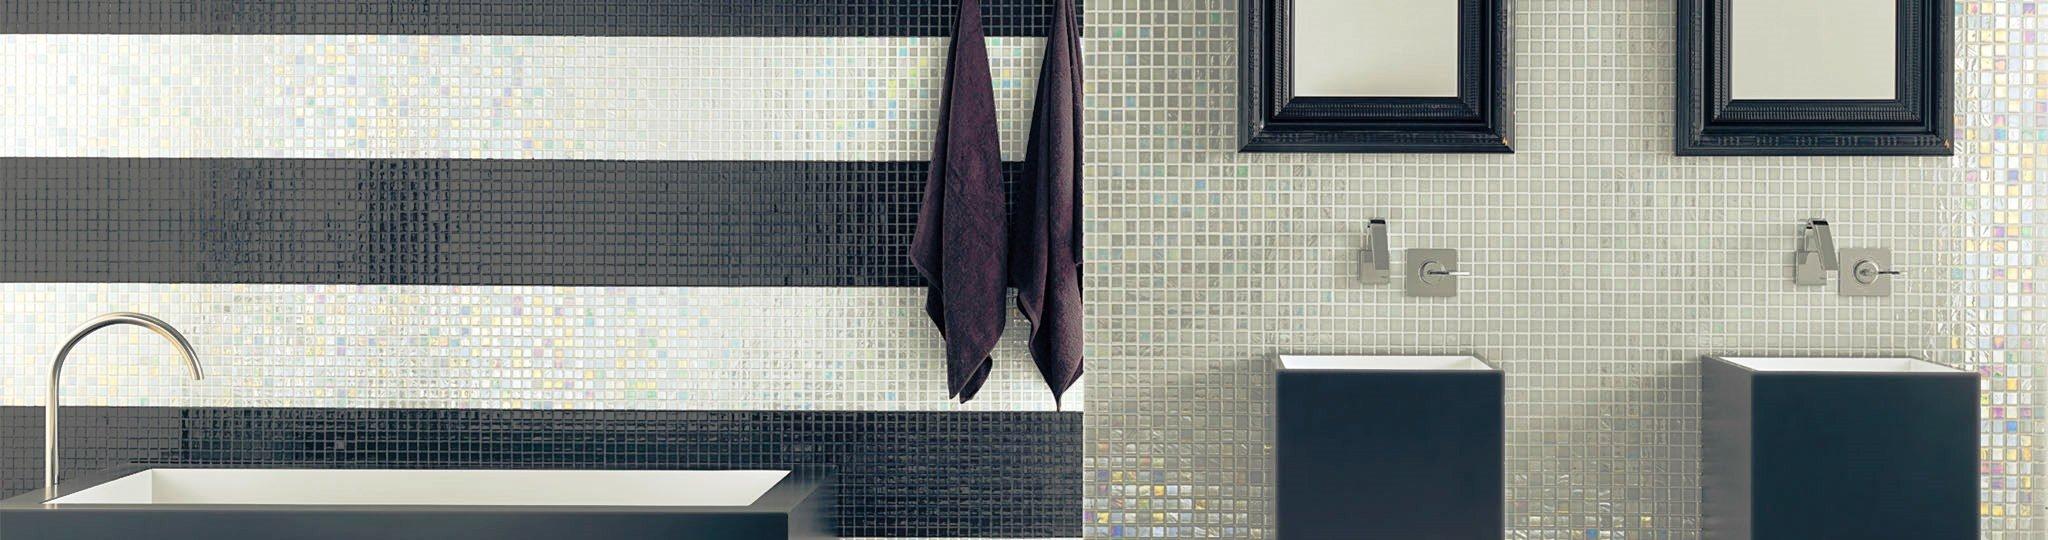 Astounding Glass Floor Tile Bathroom Of Bath And Shower Tiles